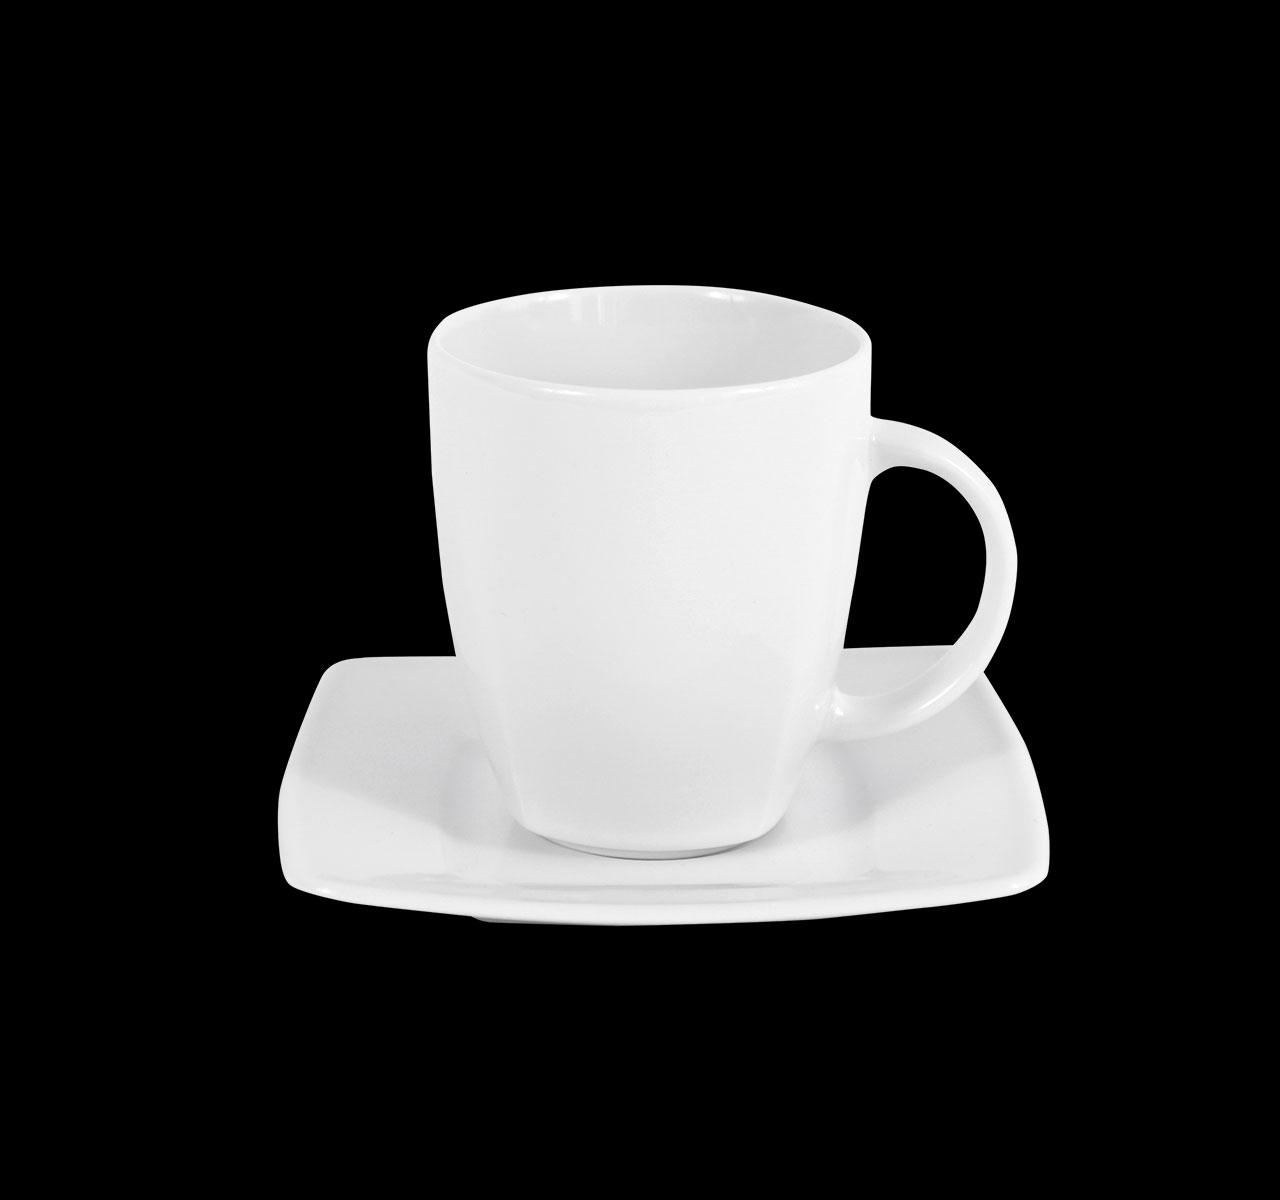 Kaffeetasse Ambrassador, weiß, 180 ml